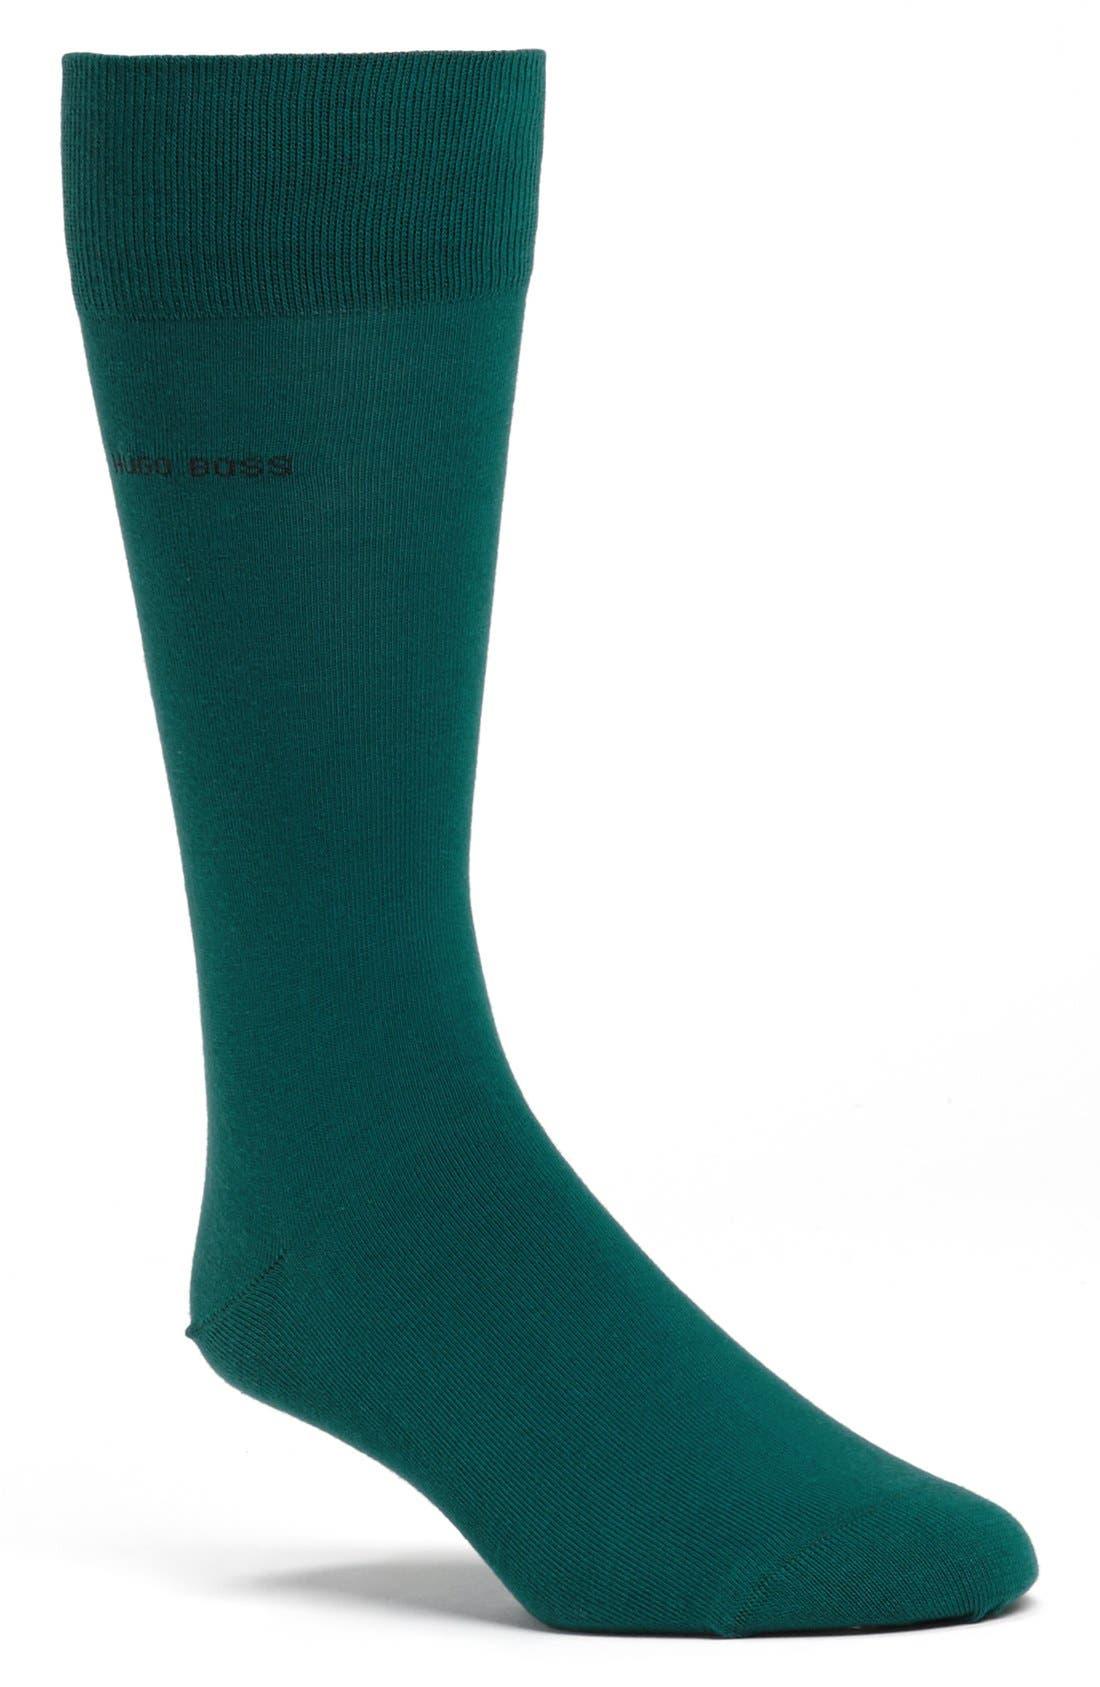 Alternate Image 1 Selected - BOSS HUGO BOSS 'Marc' Stretch Cotton Socks